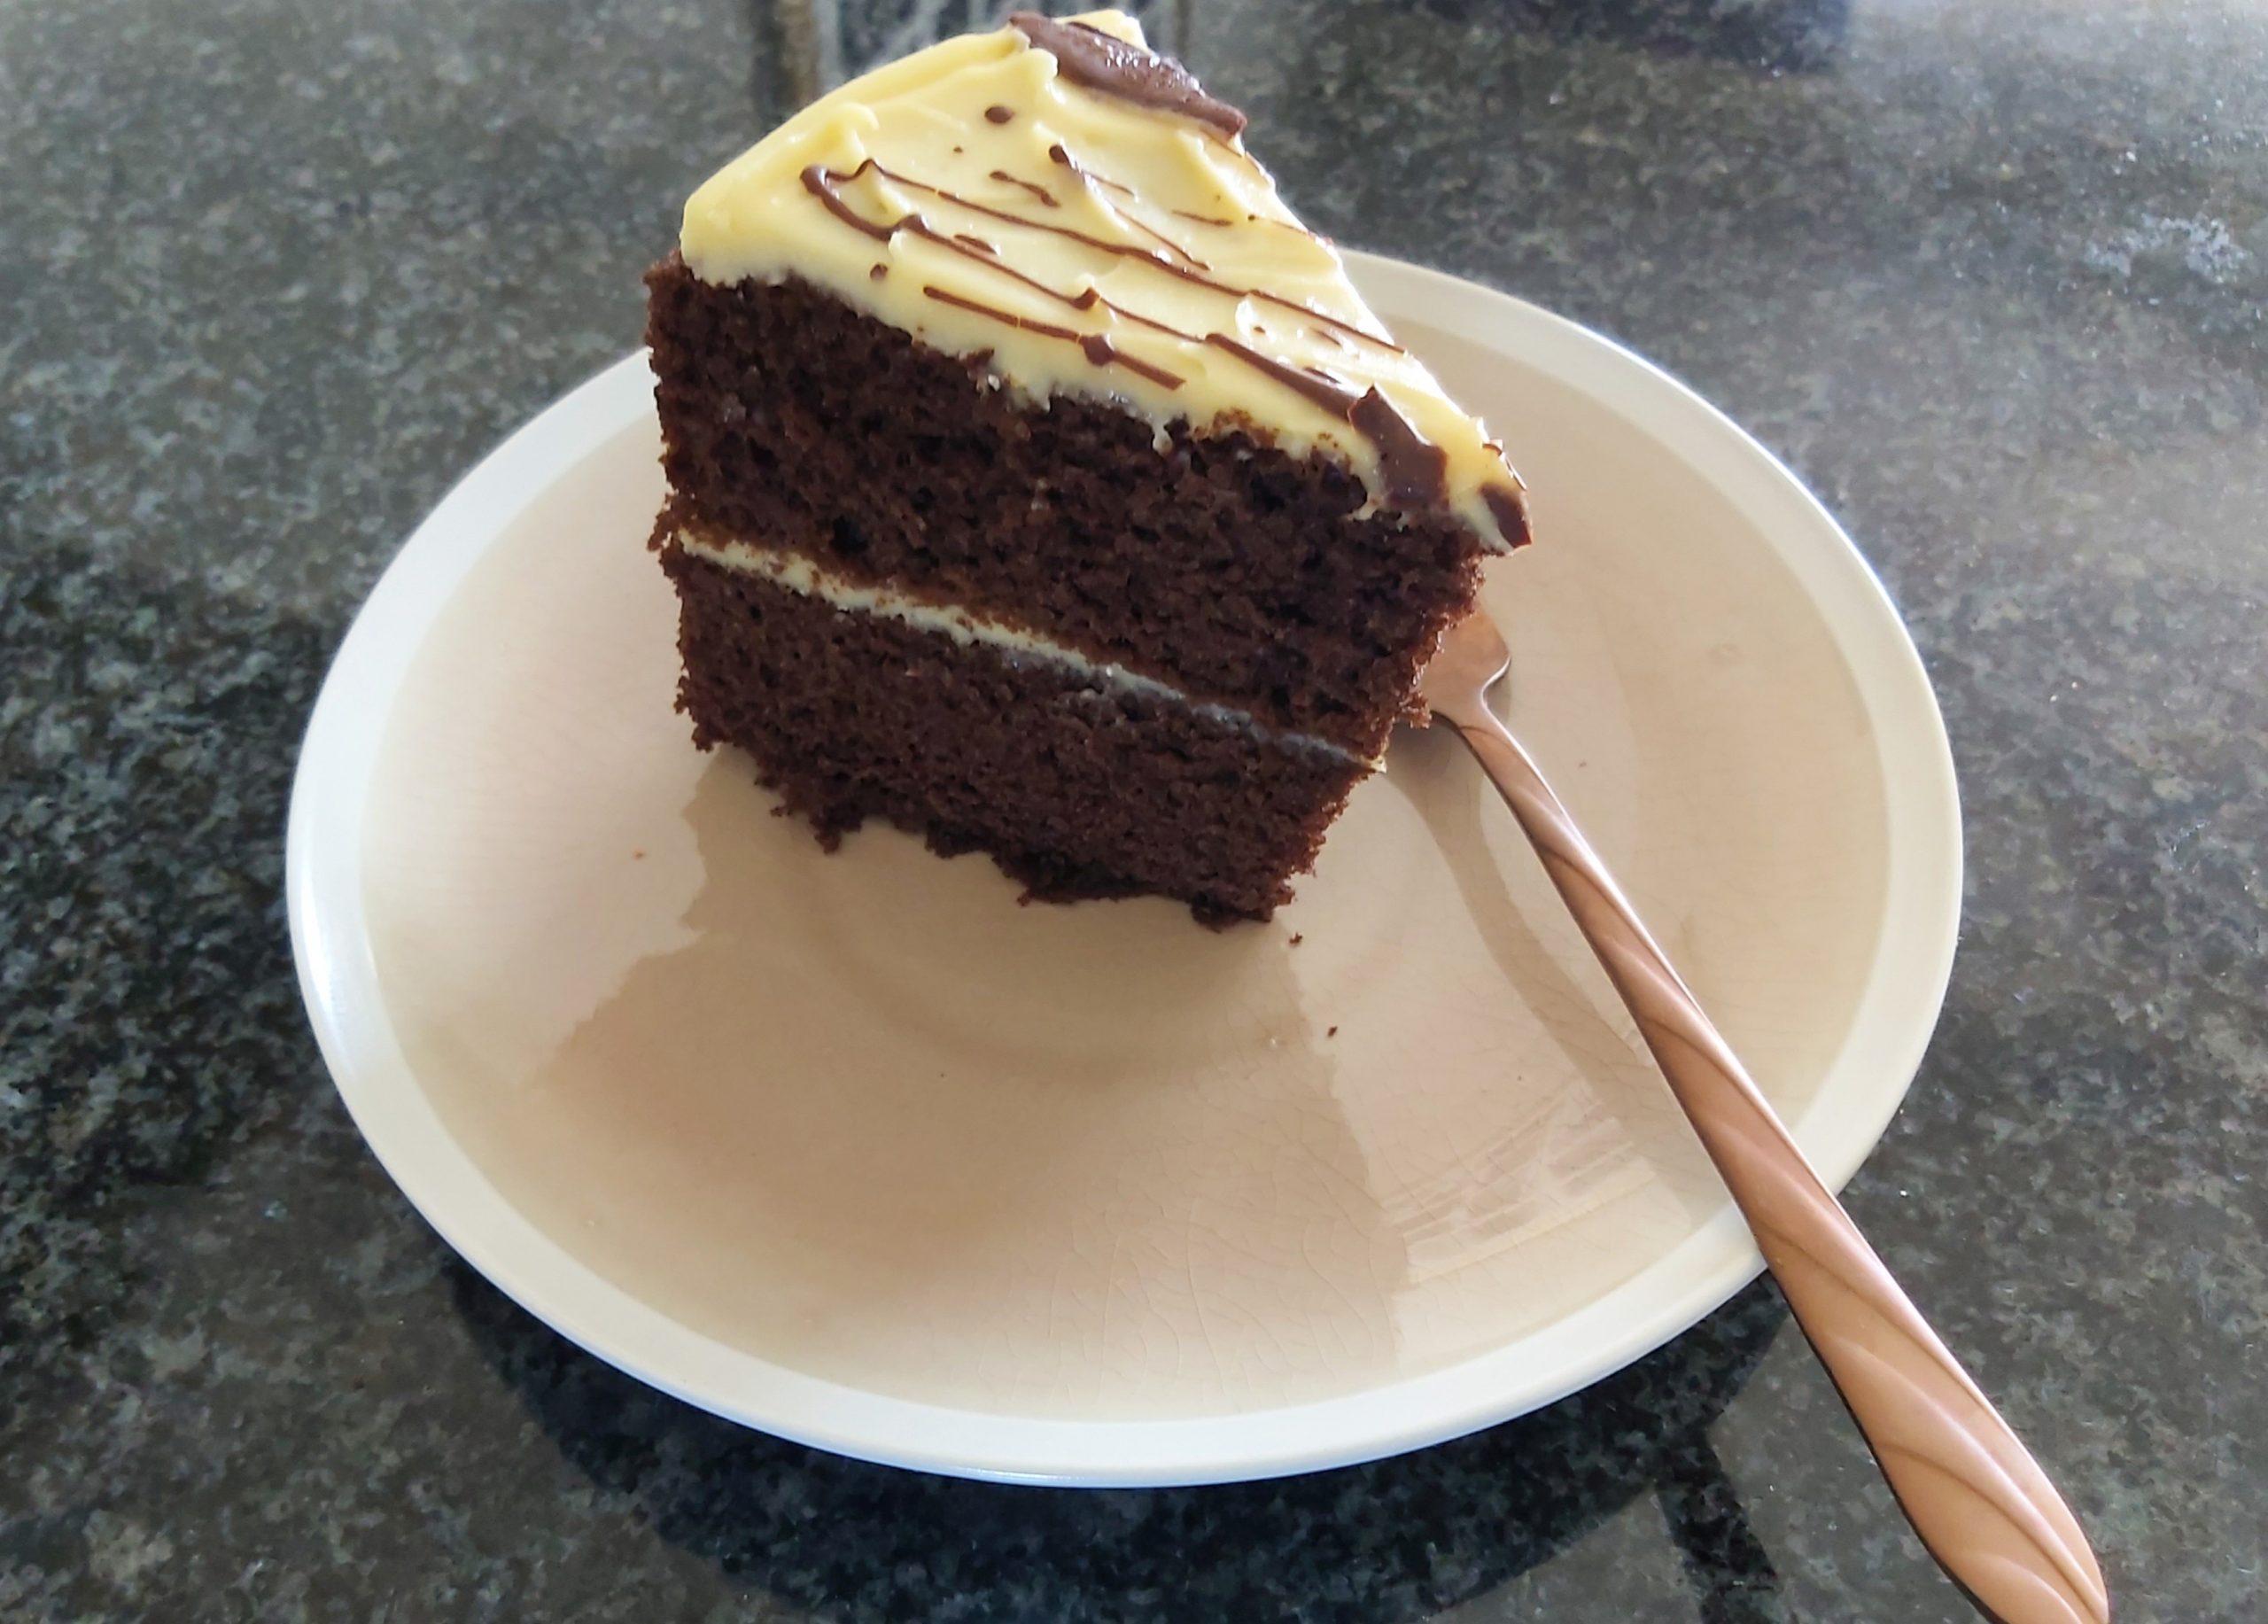 CAKE SISTERS BAKERIES